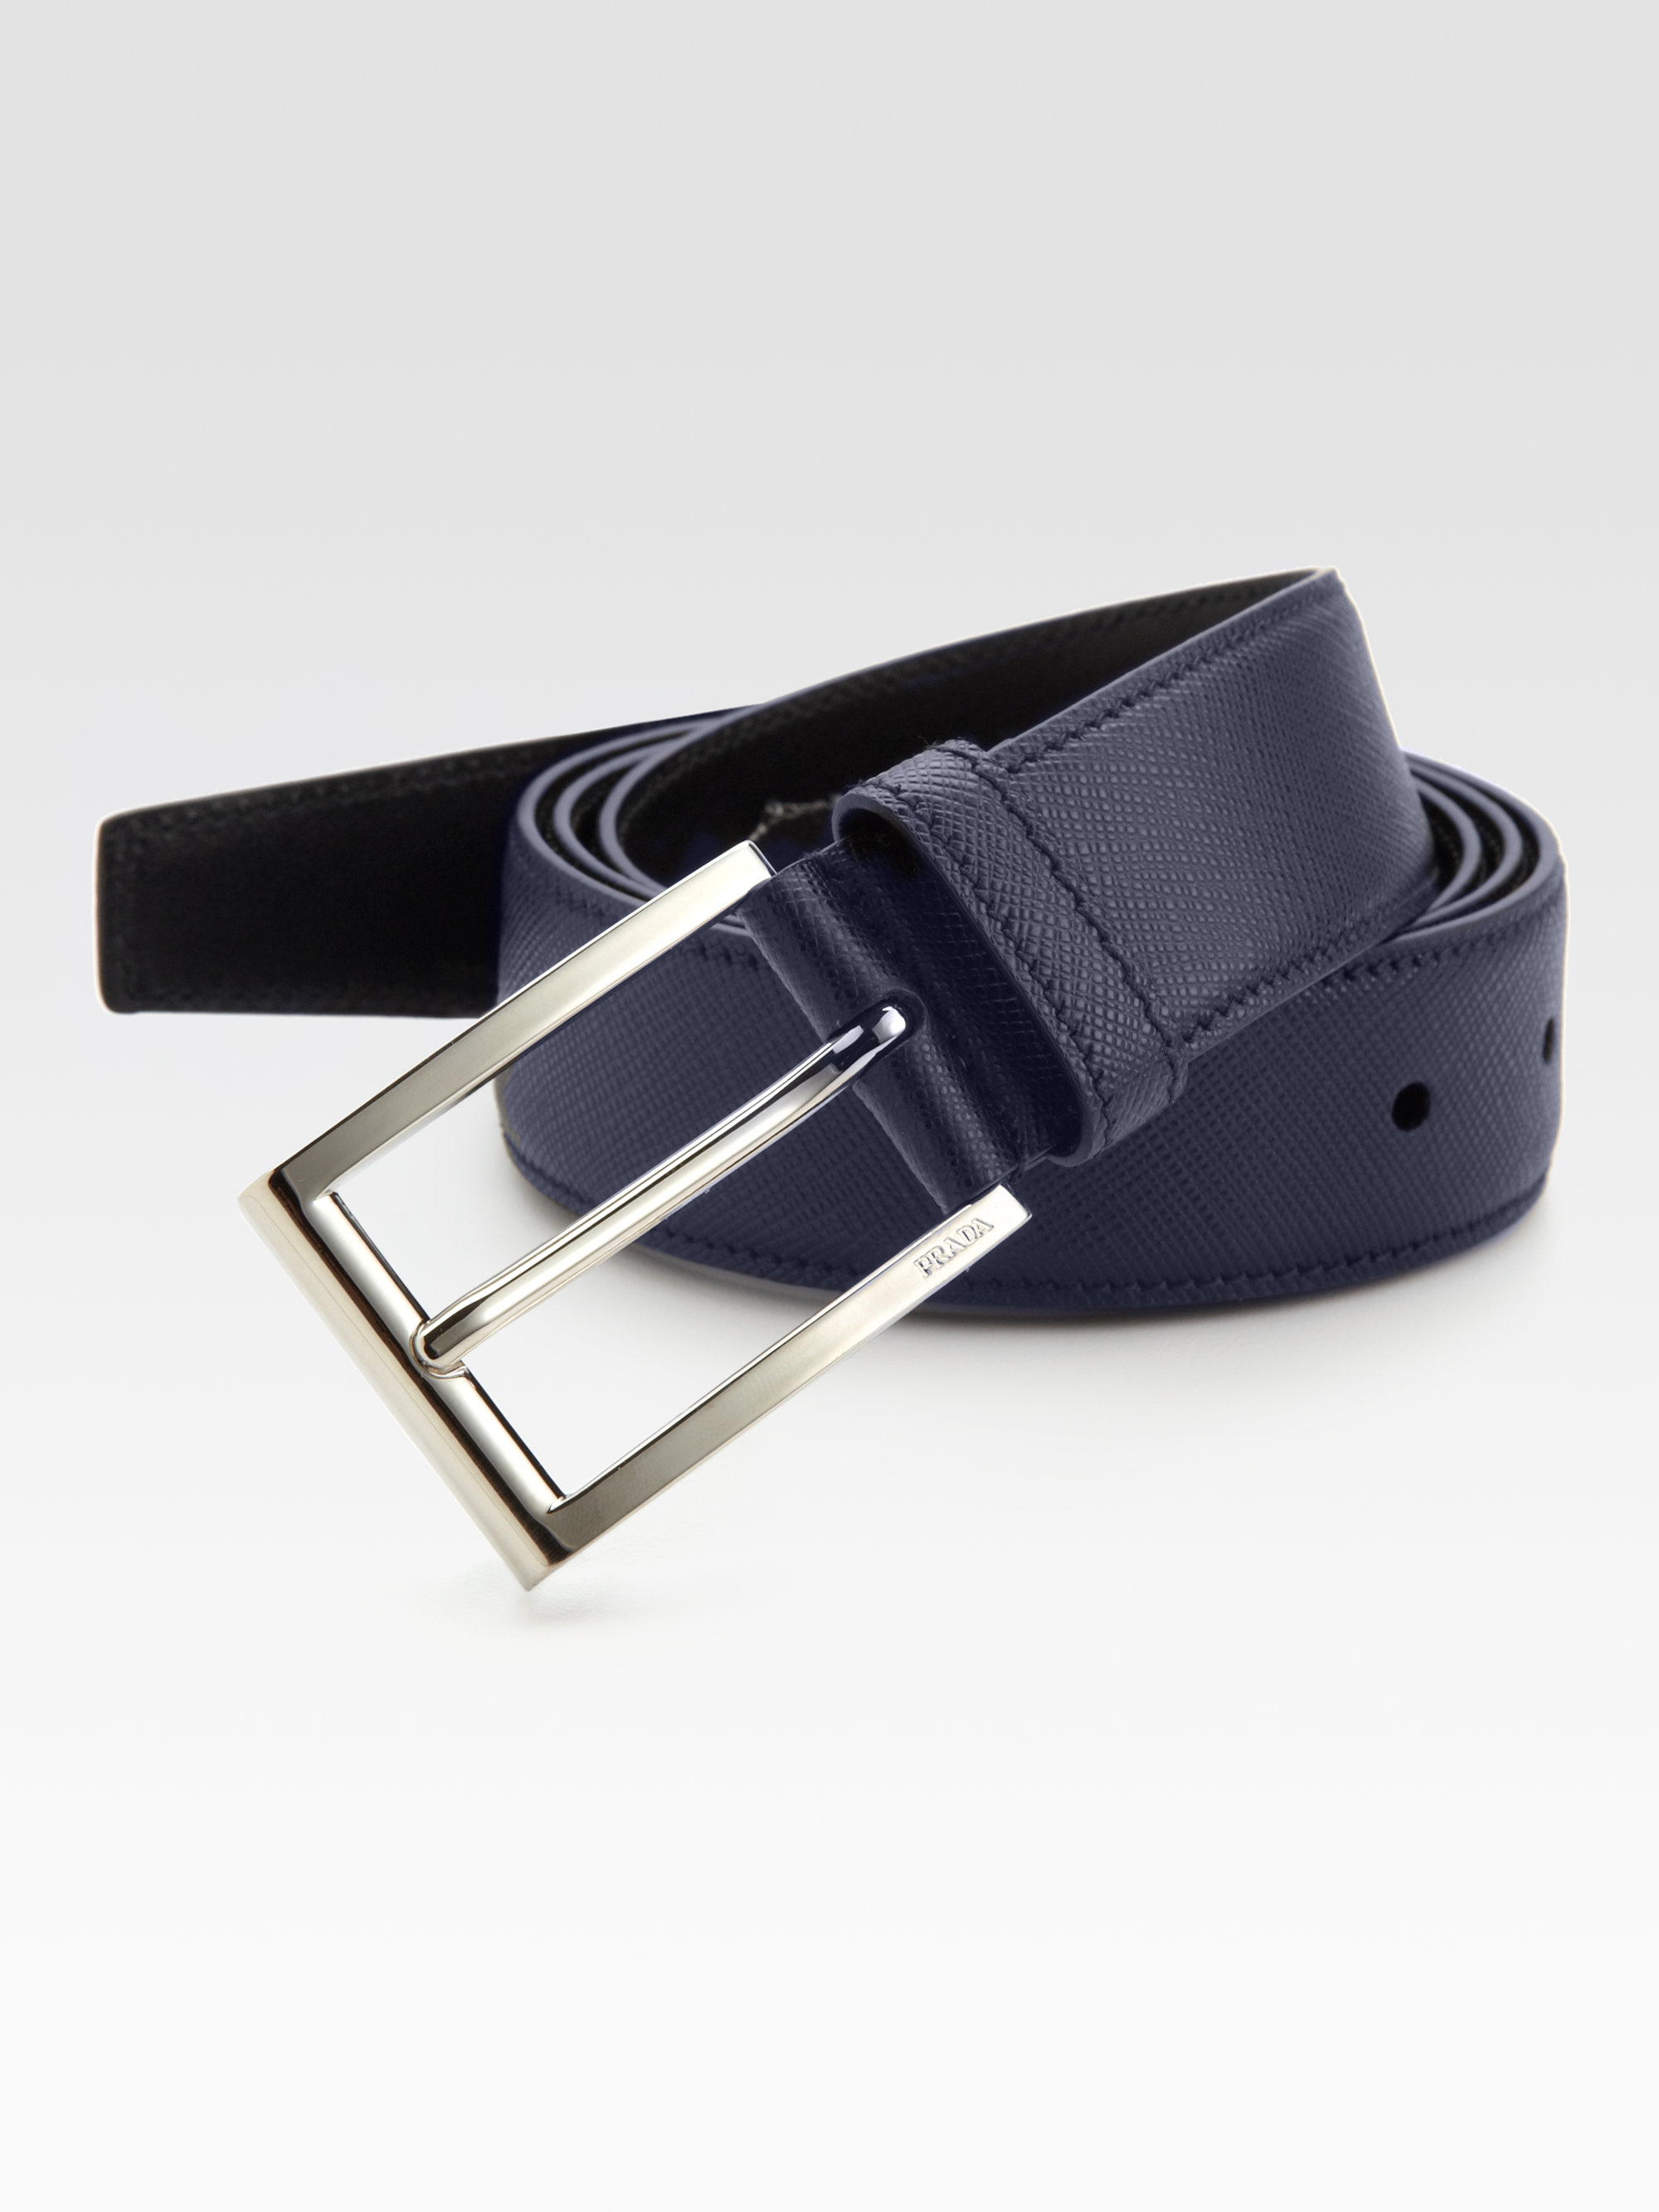 Prada Saffiano Dress Belt In Blue For Men